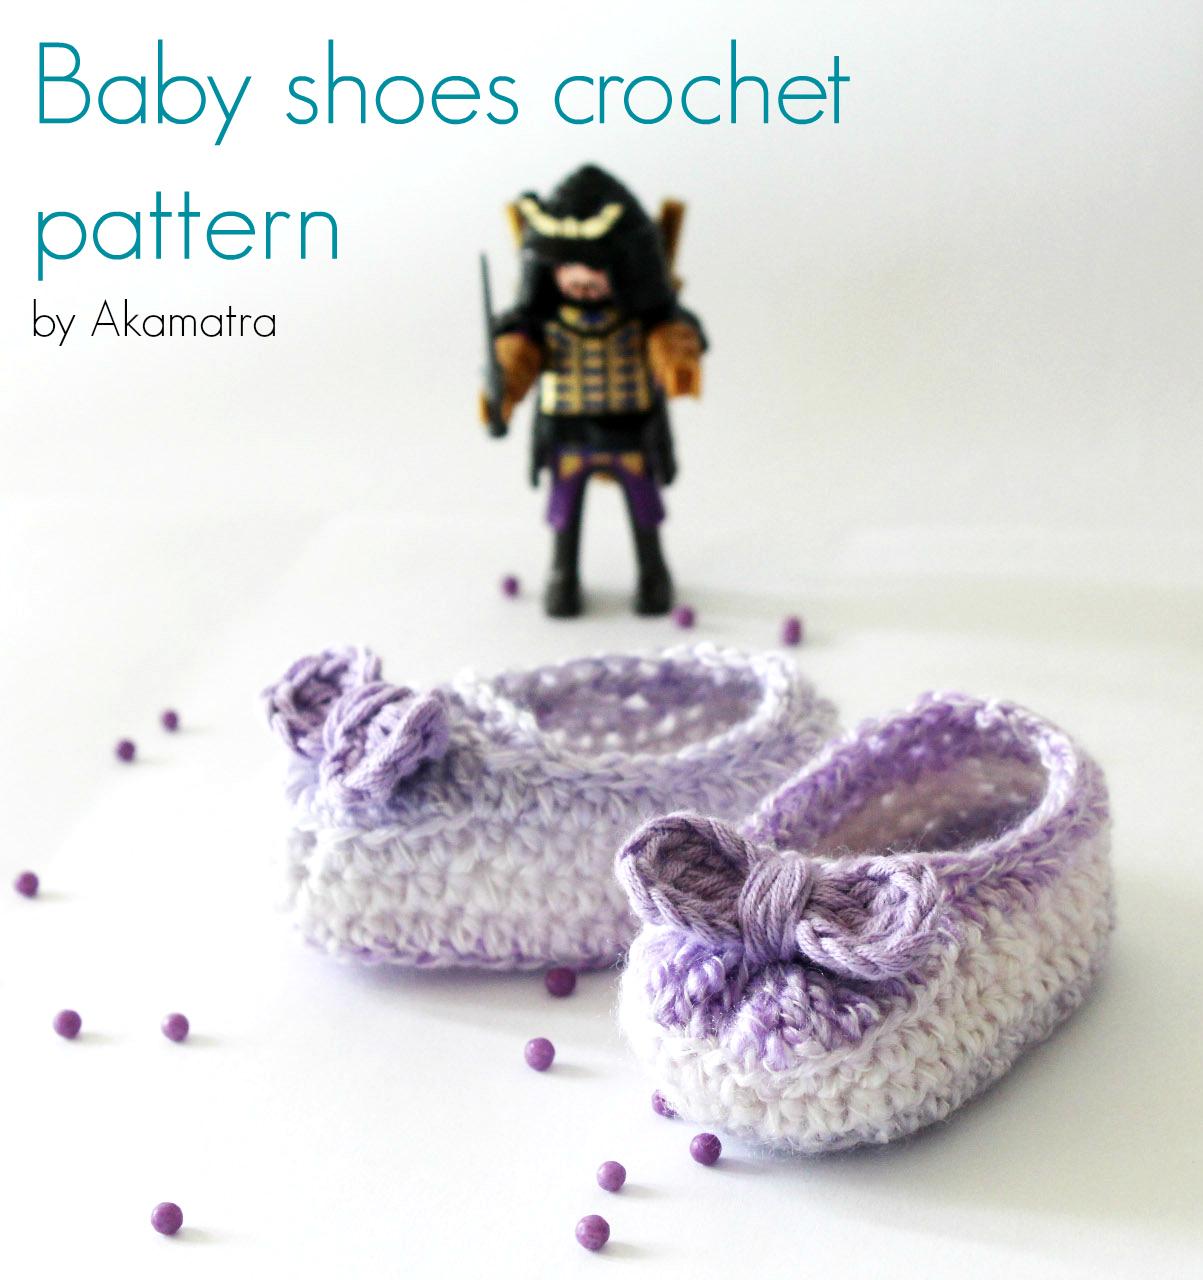 Baby shoes crochet pattern - Akamatra